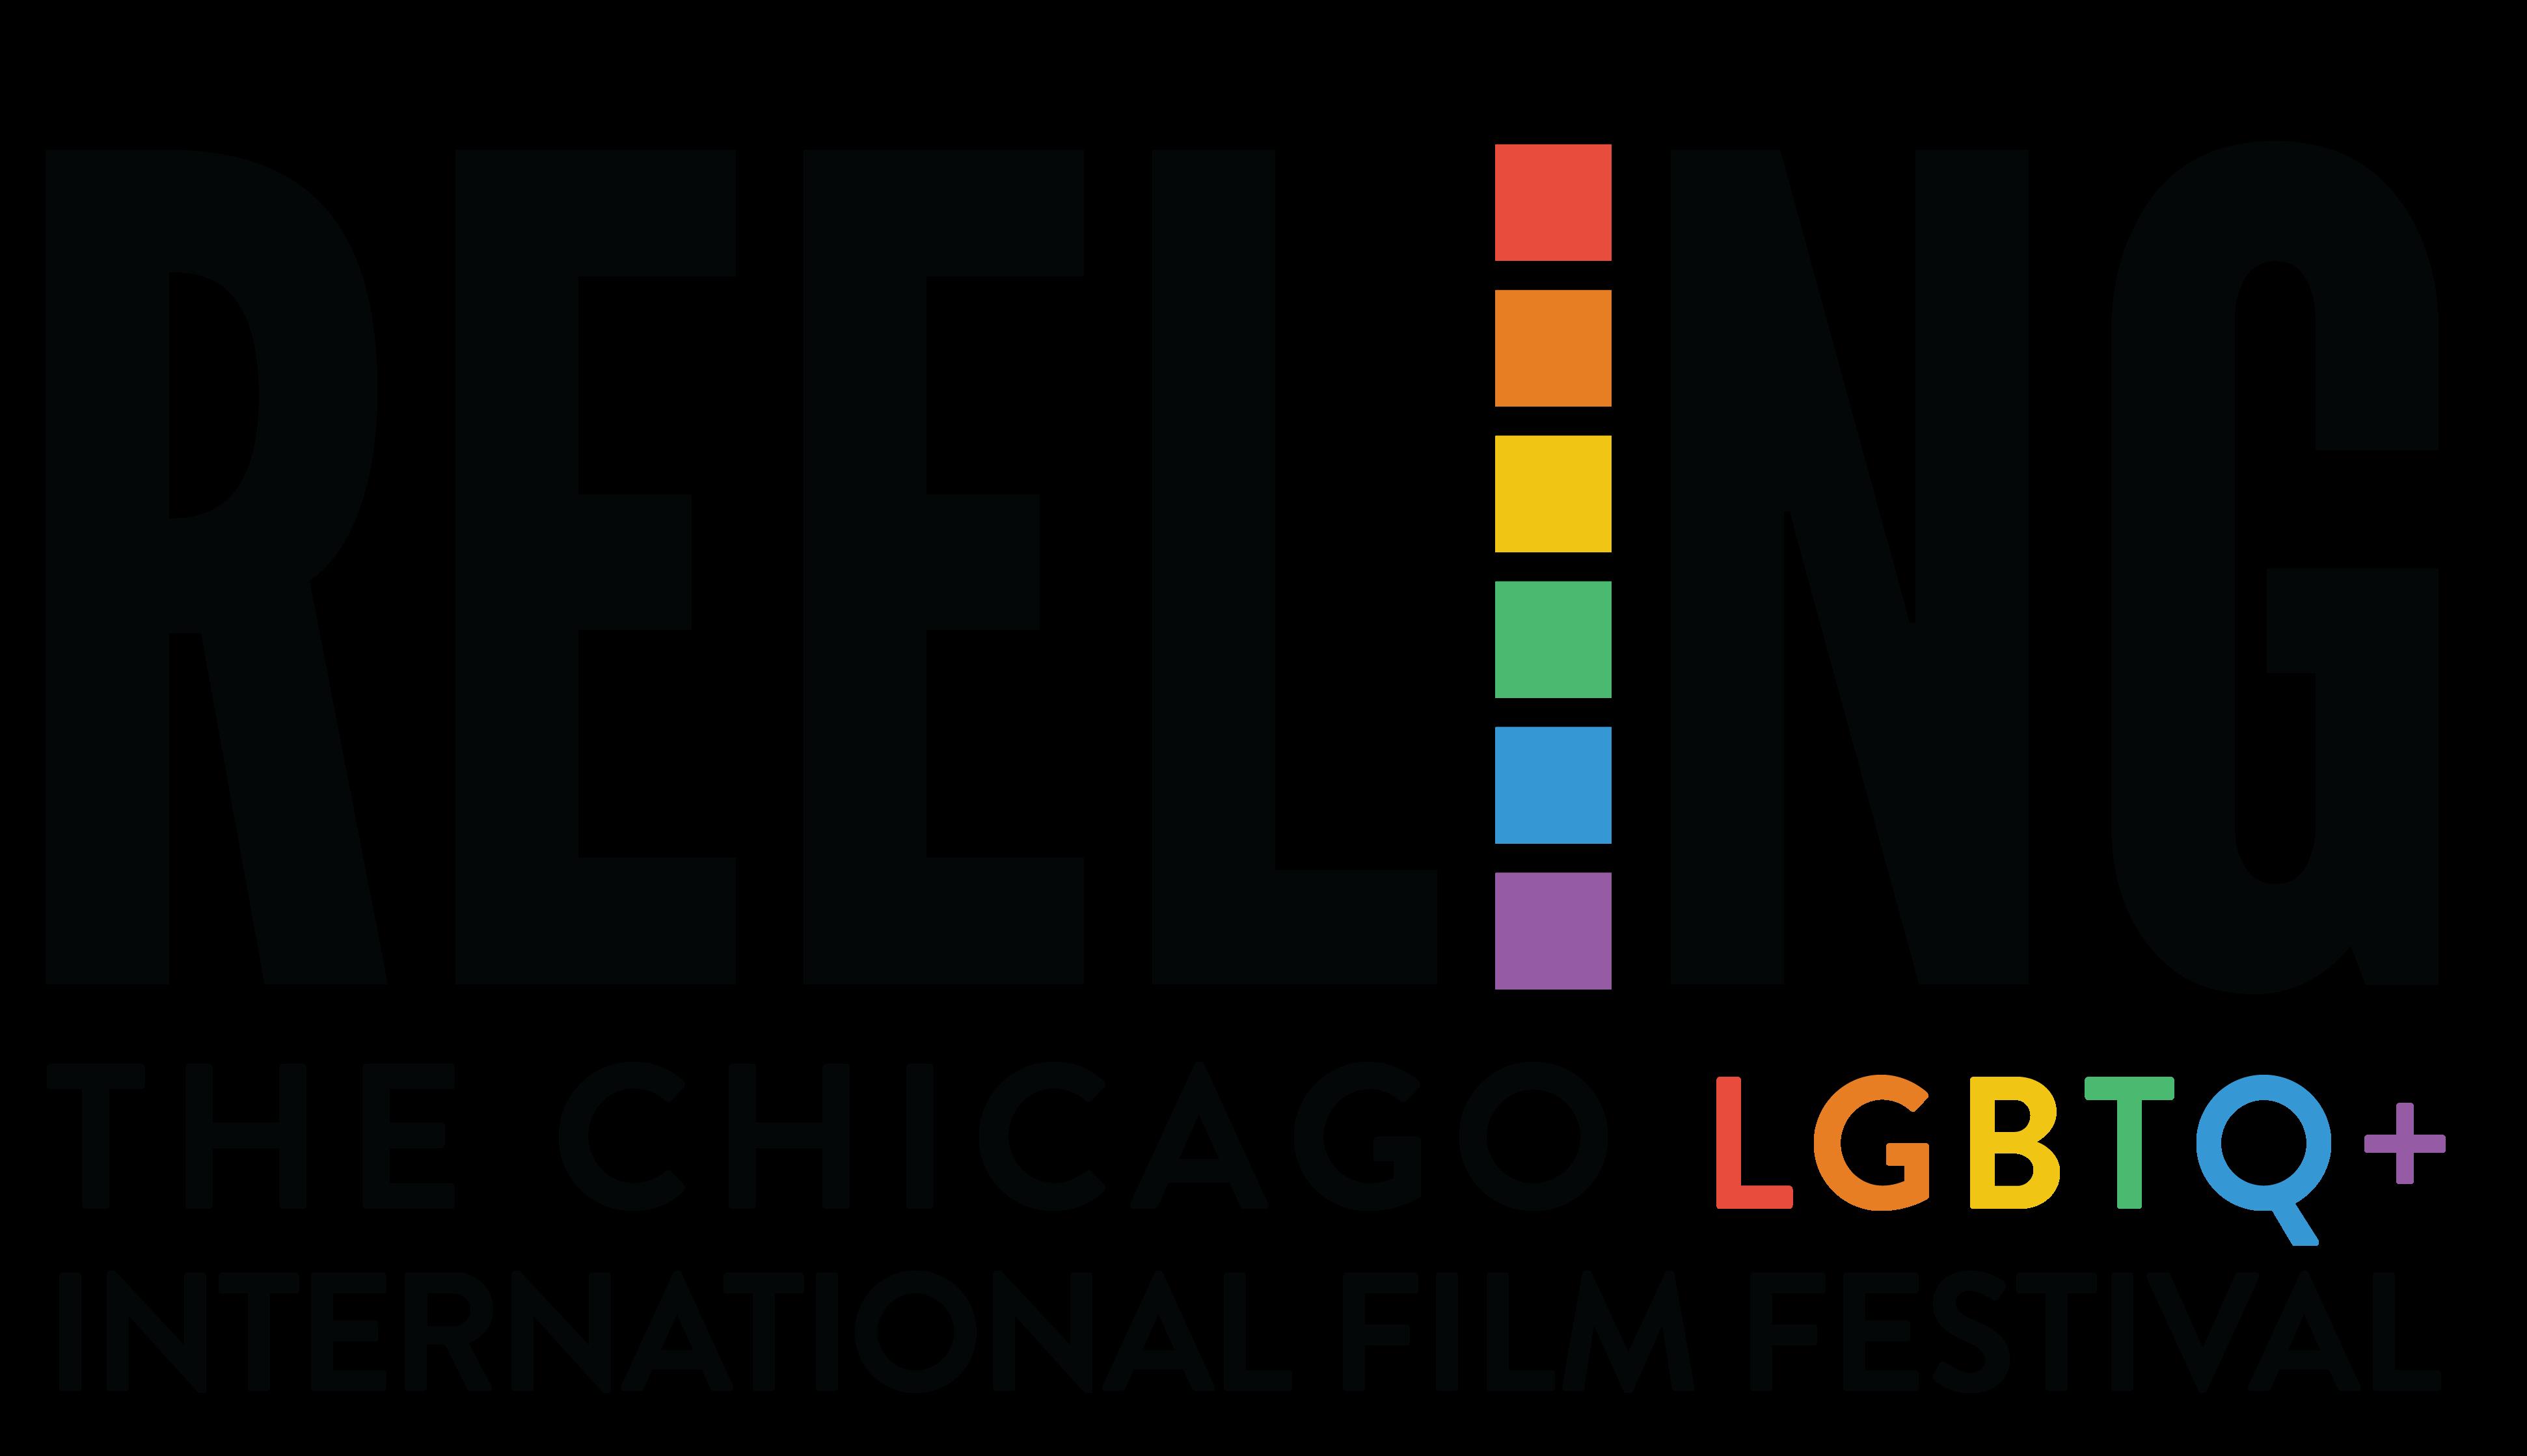 Reeling: The Chicago LGBTQ + International Film Festival